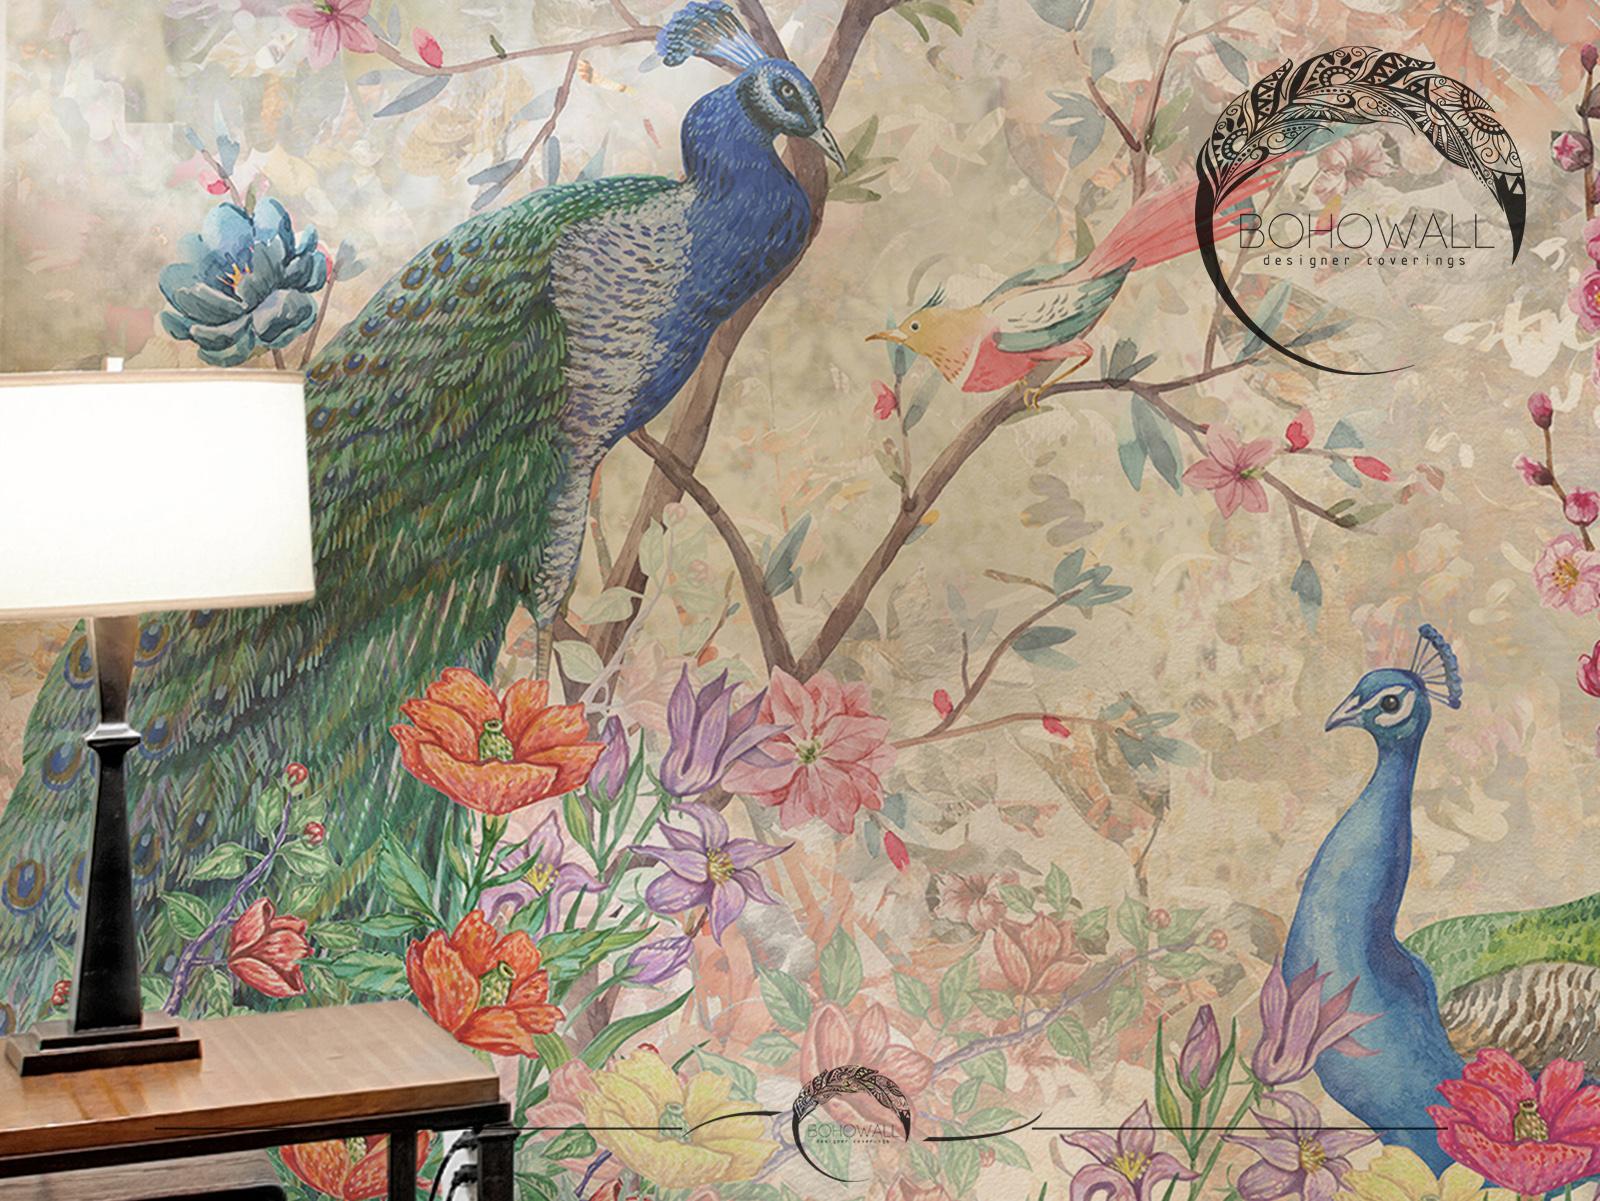 Freska_SOLUR_Bohowall_